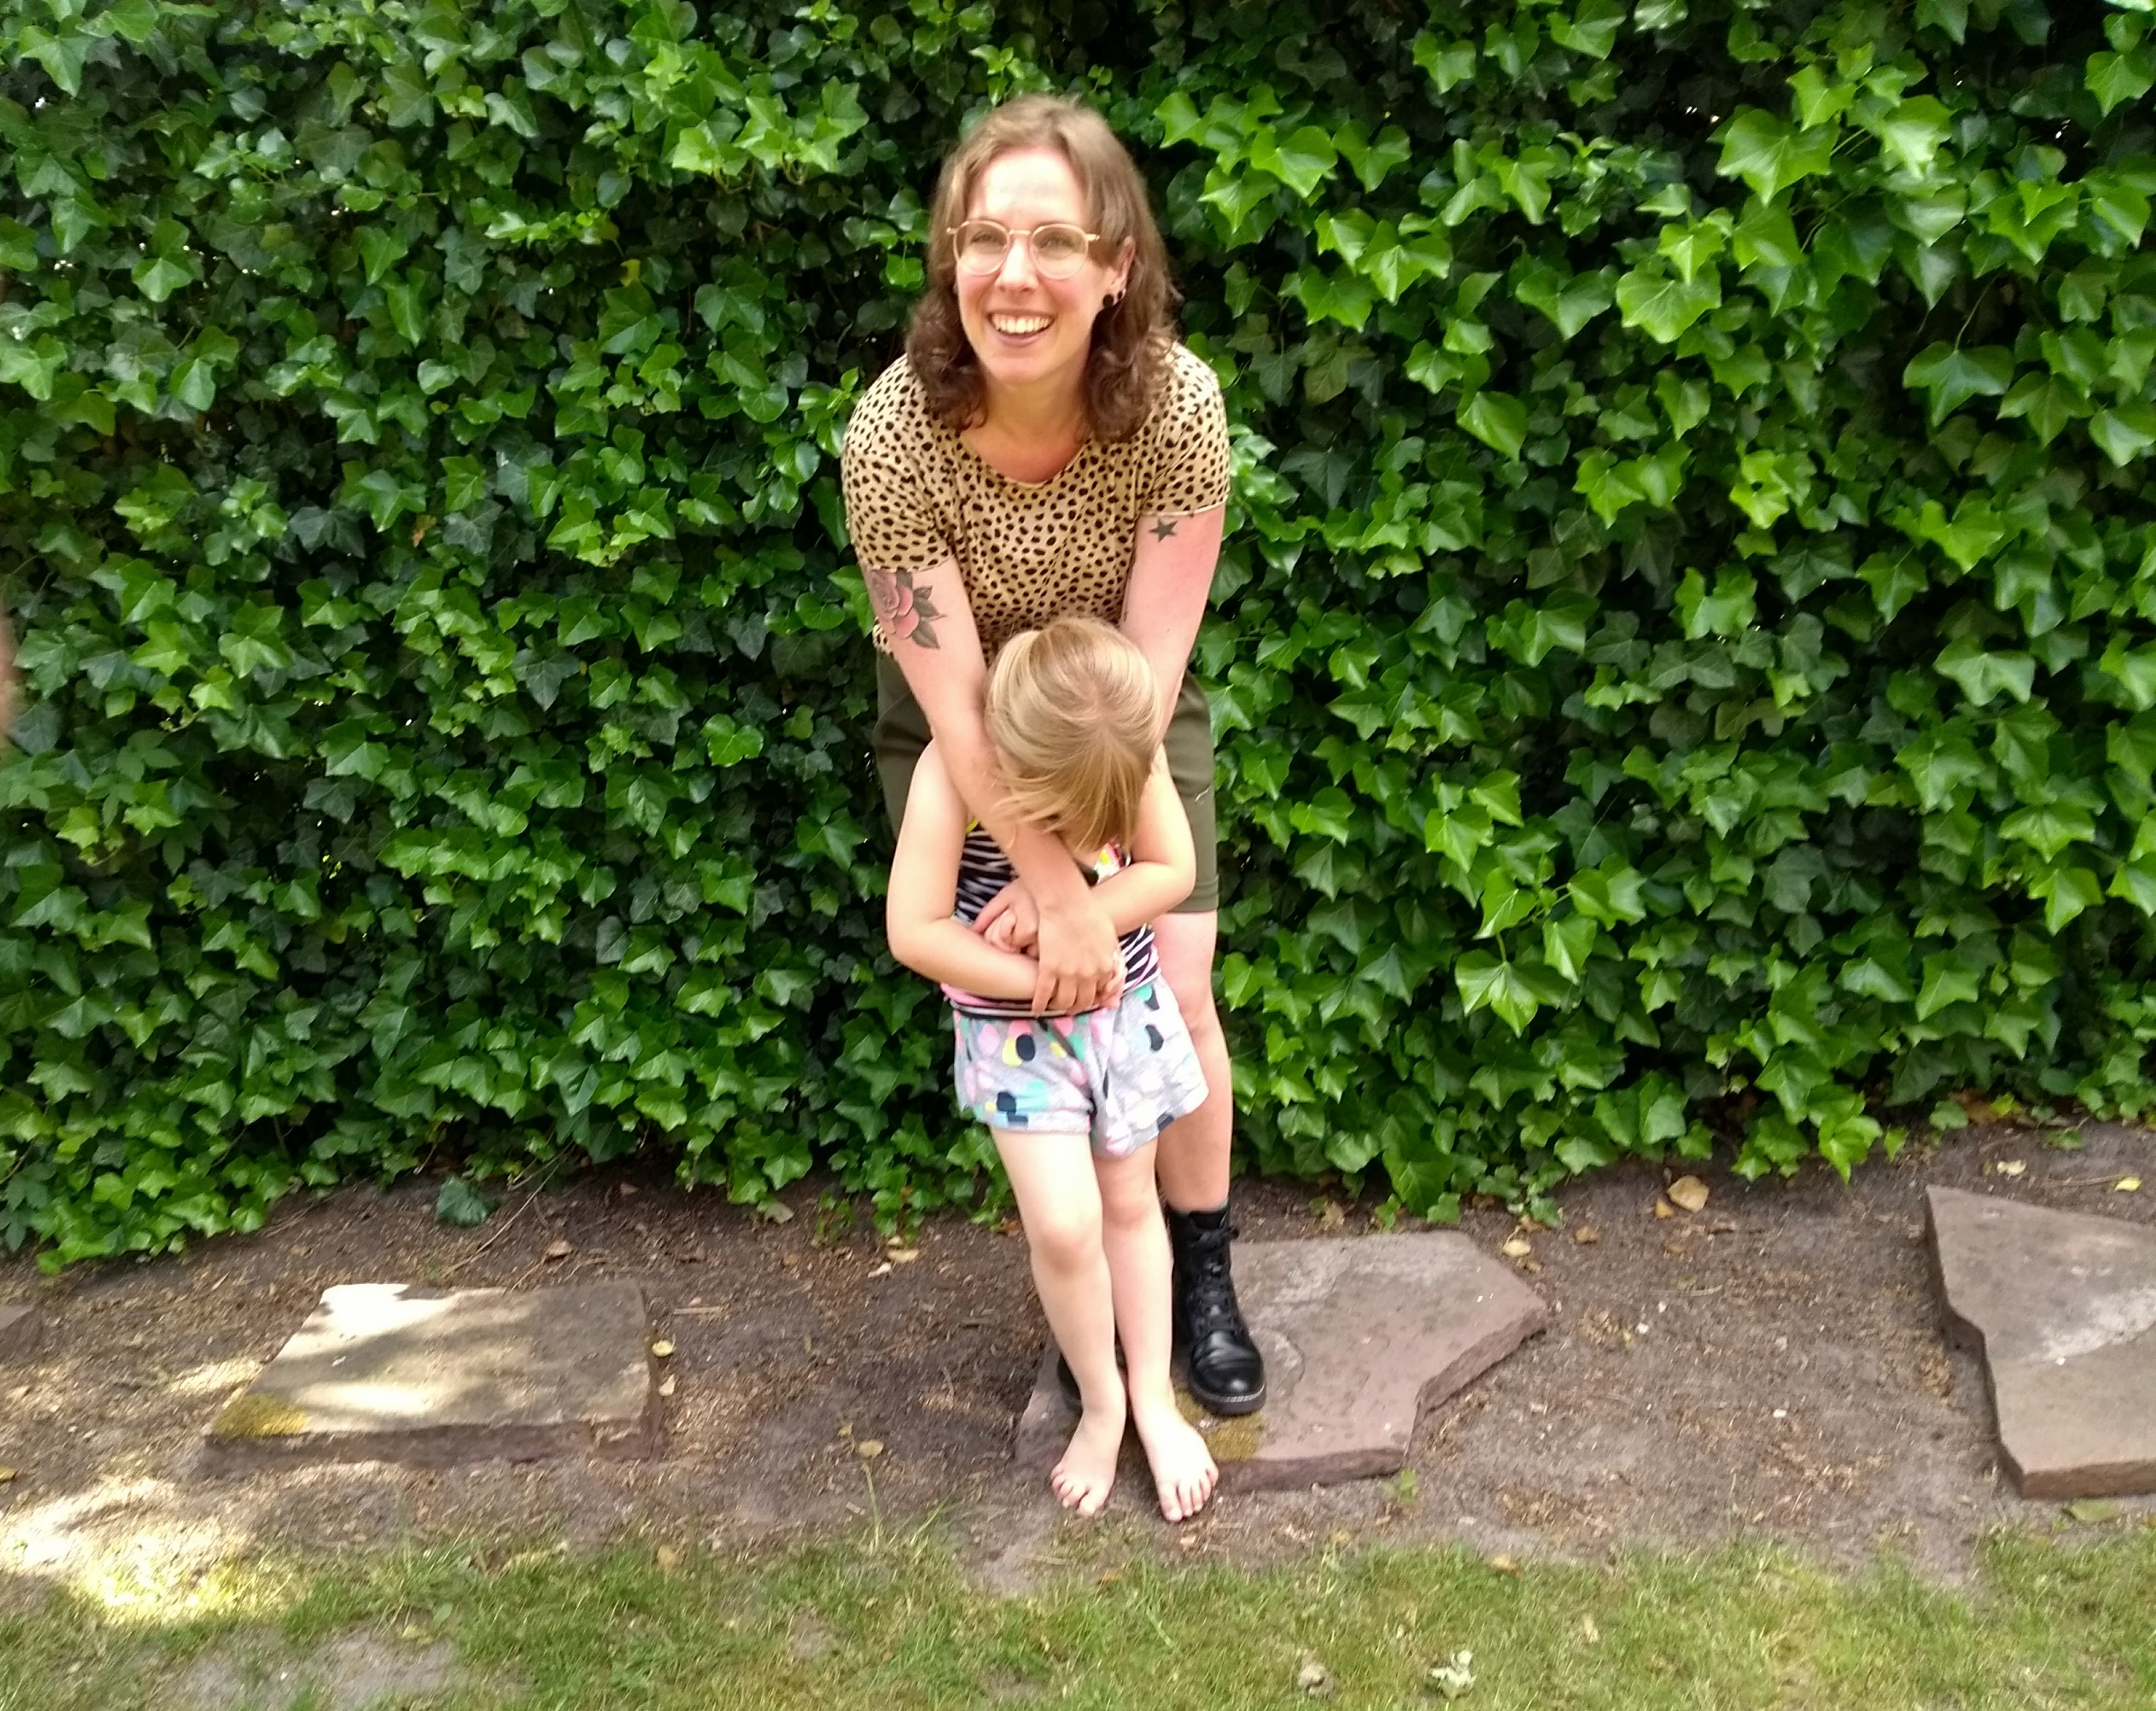 yoga, mindful, mindset, ontspannen, meer tijd, gezinsleven, mama van drie, genieten, mamablog, lalog, lalog.nl, lalogblog